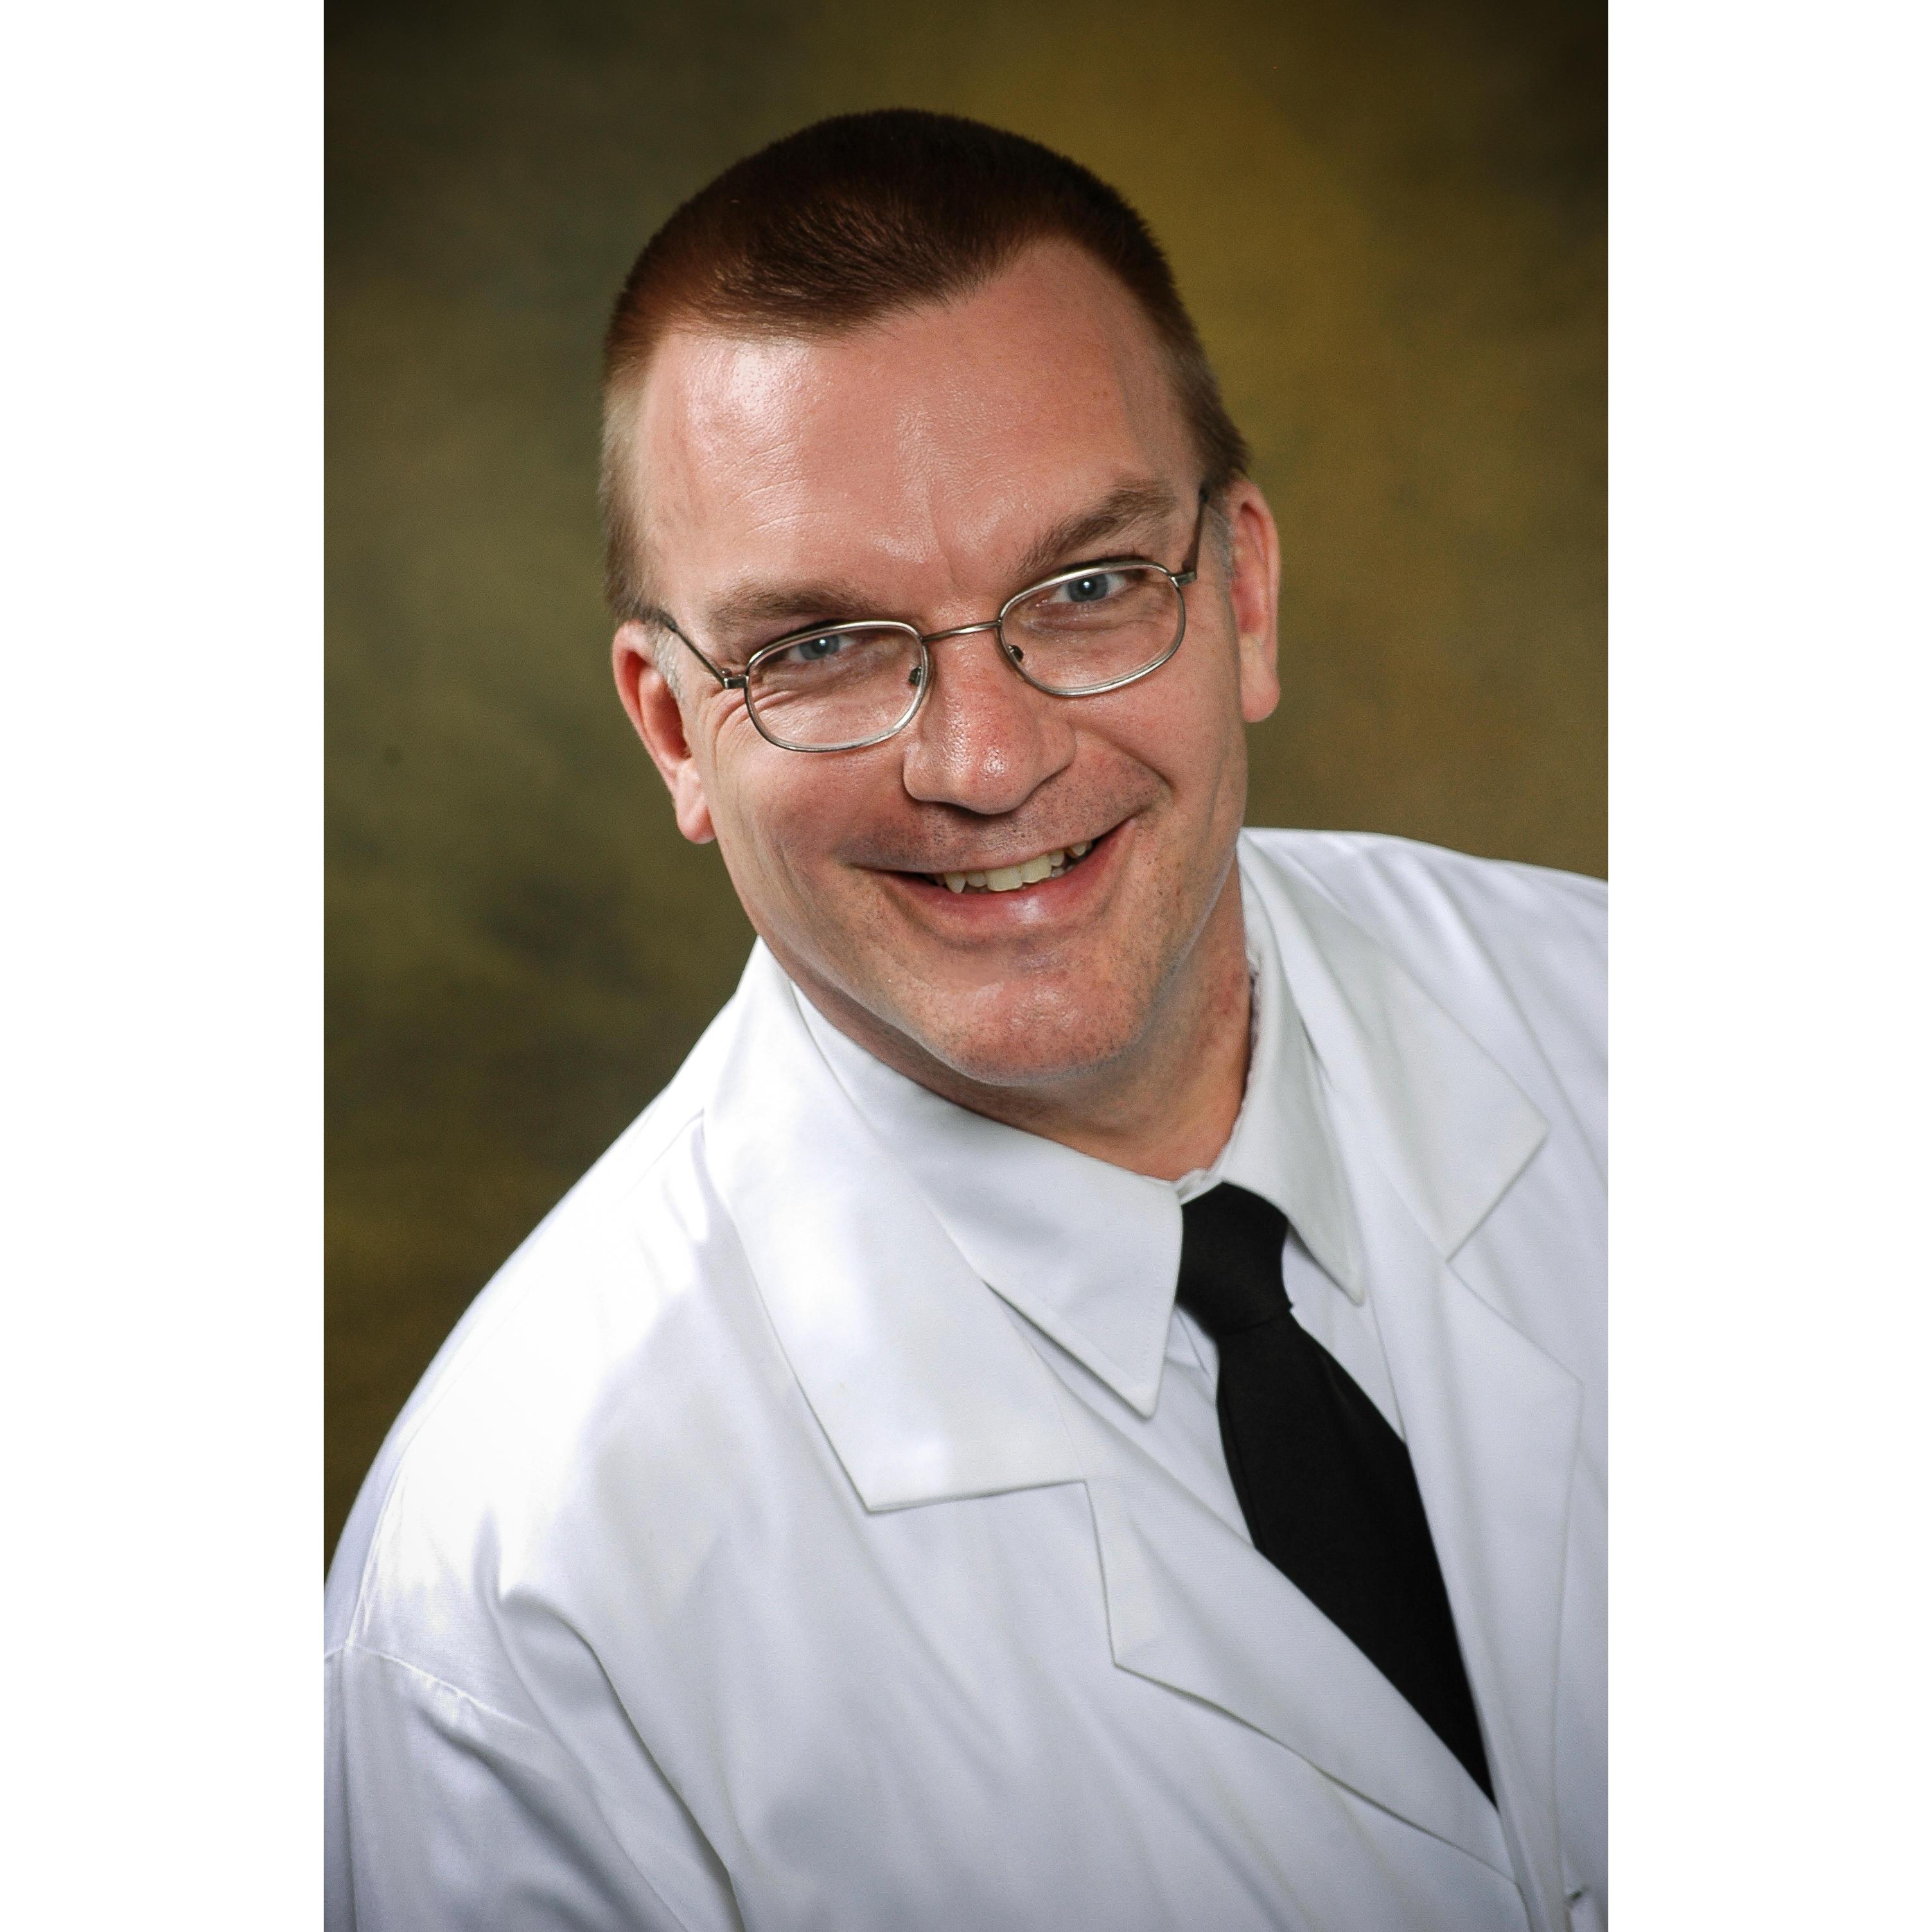 Steven Arnold, MD